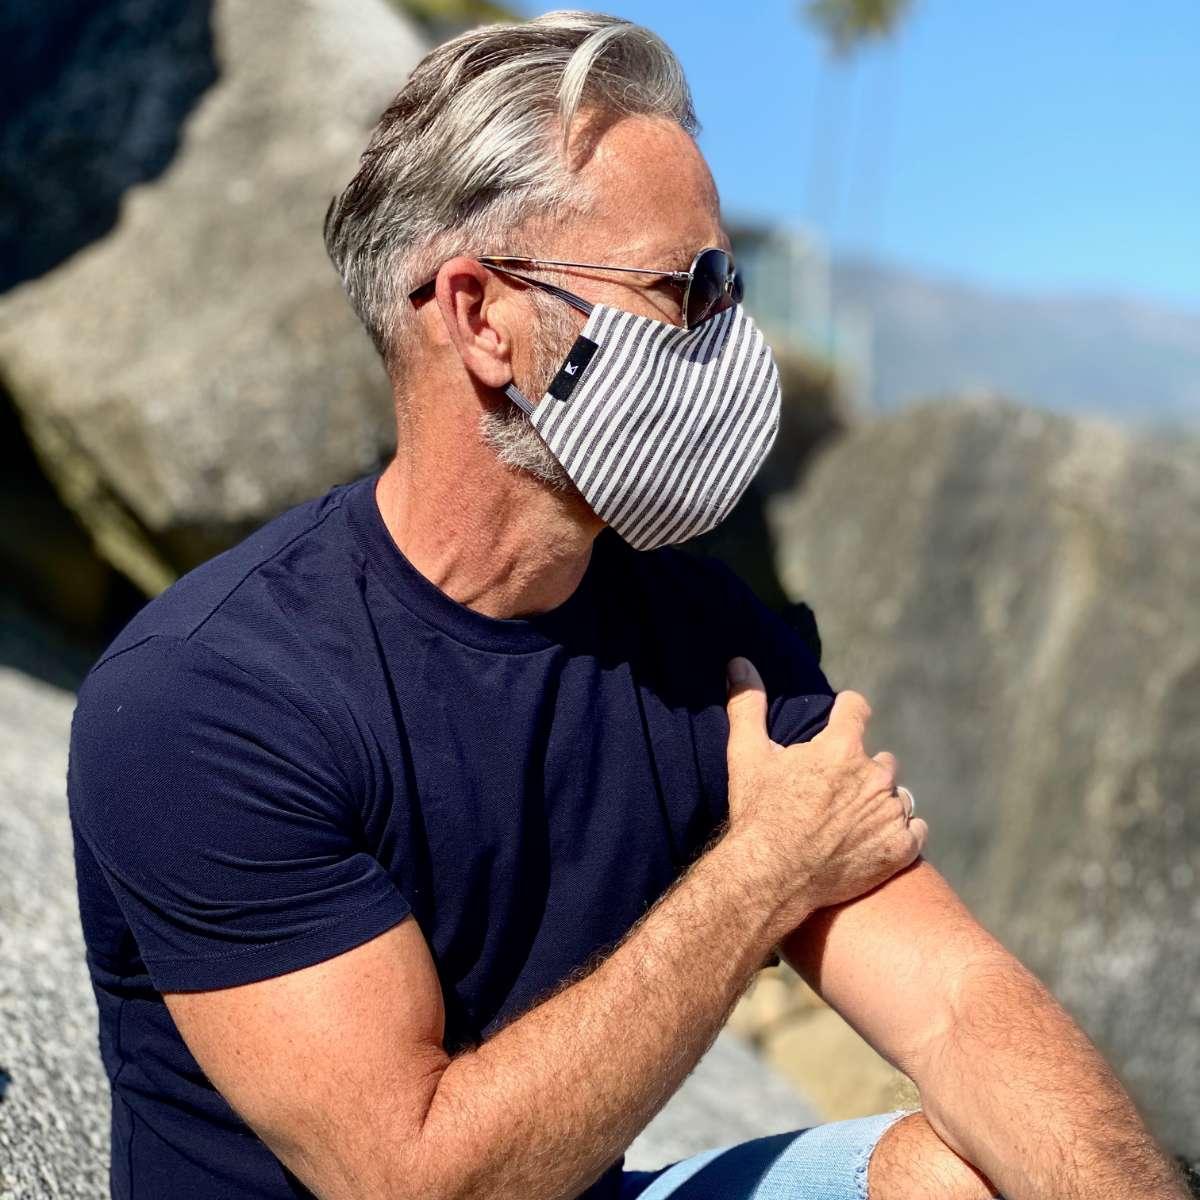 Fashion-Forward Social Responsibility - Kynsho Masks